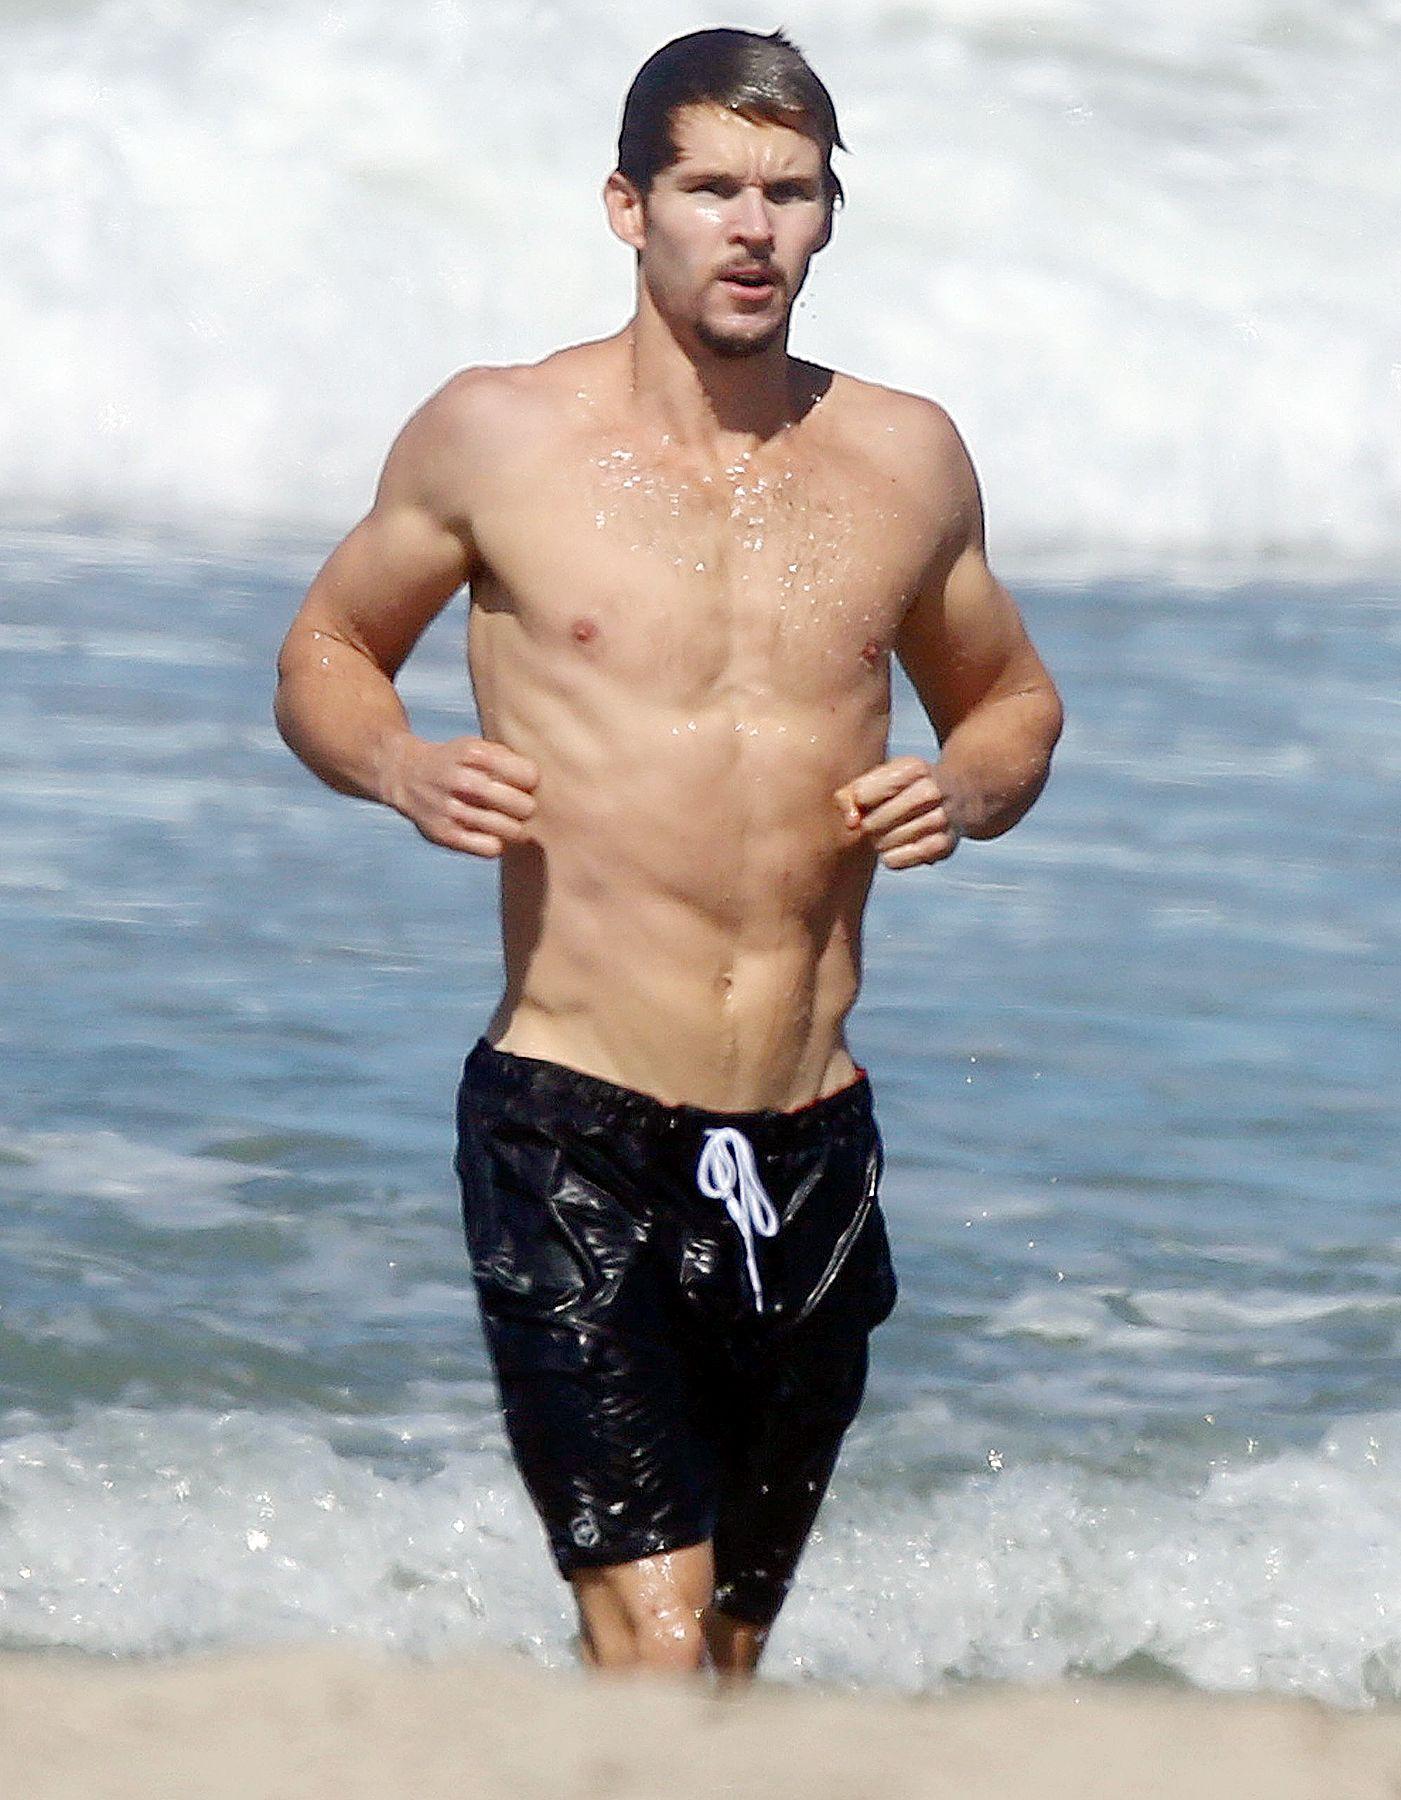 Celebrity Bikini Malfunctions: From Nip Slips to Crotch Shots